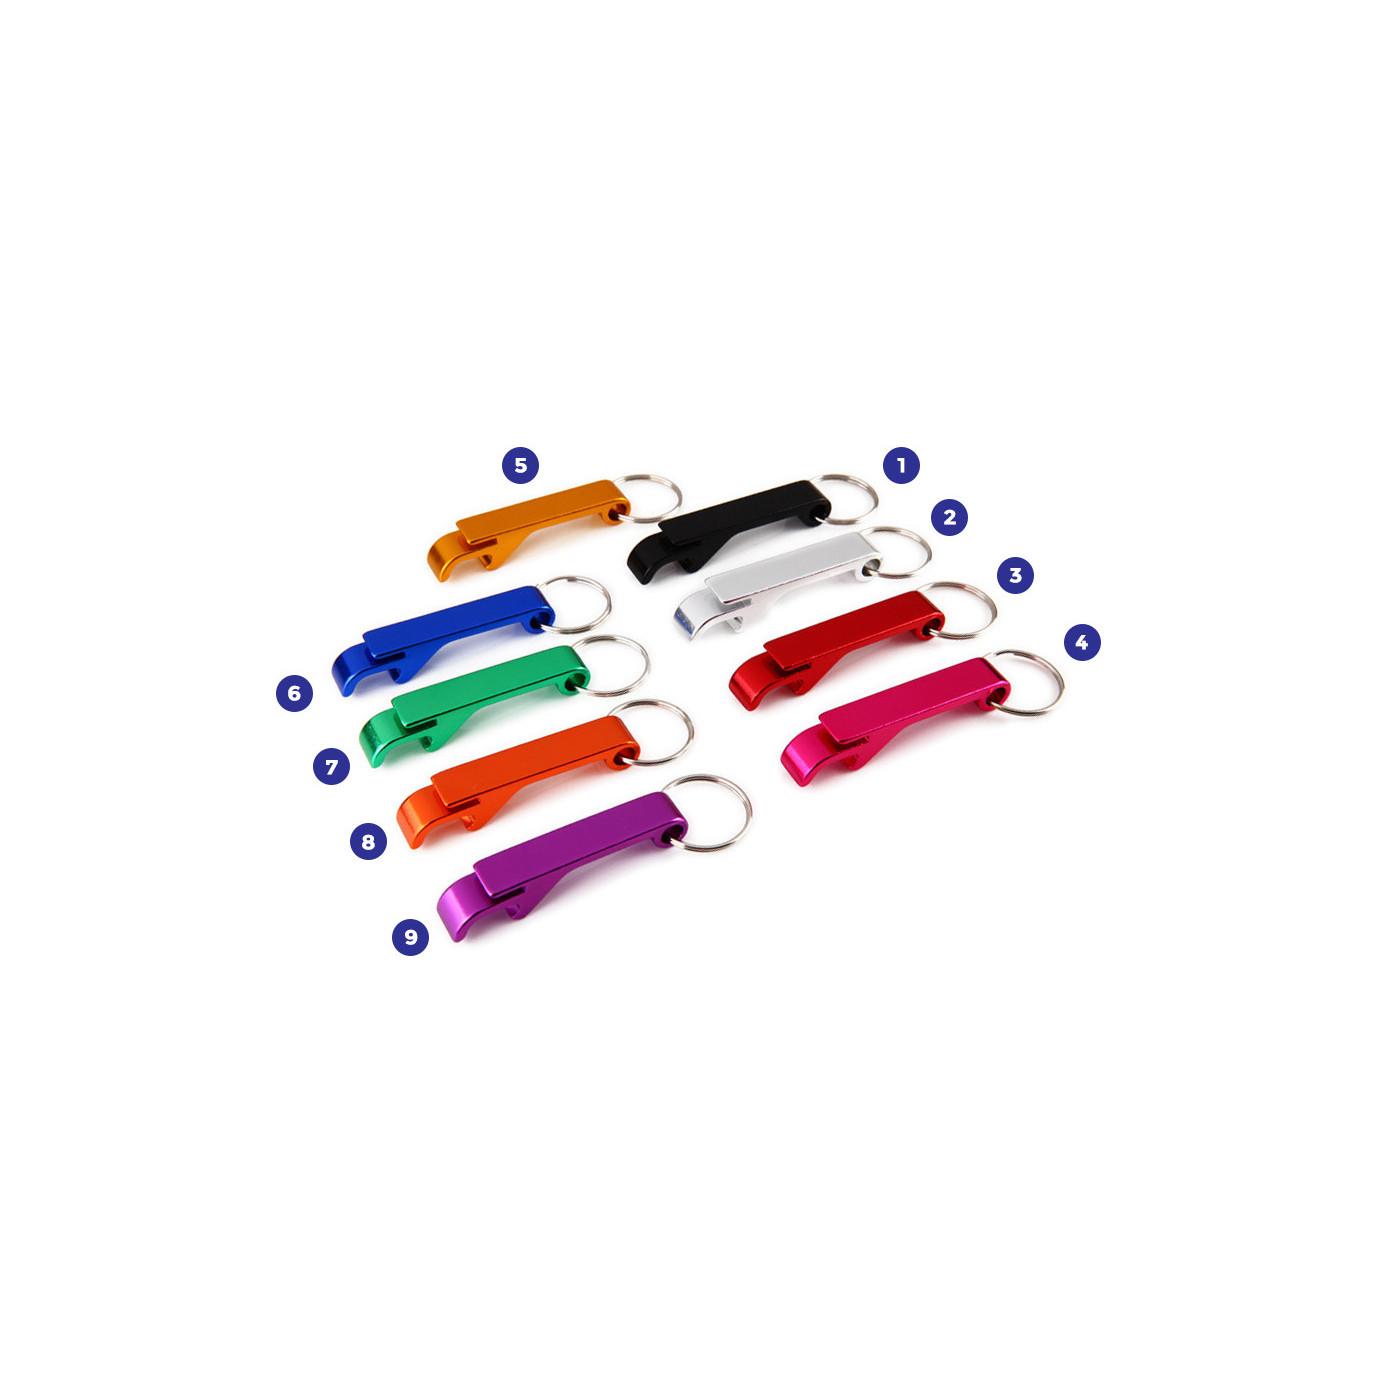 Set of 10 metal bottle openers, color 8: dark orange